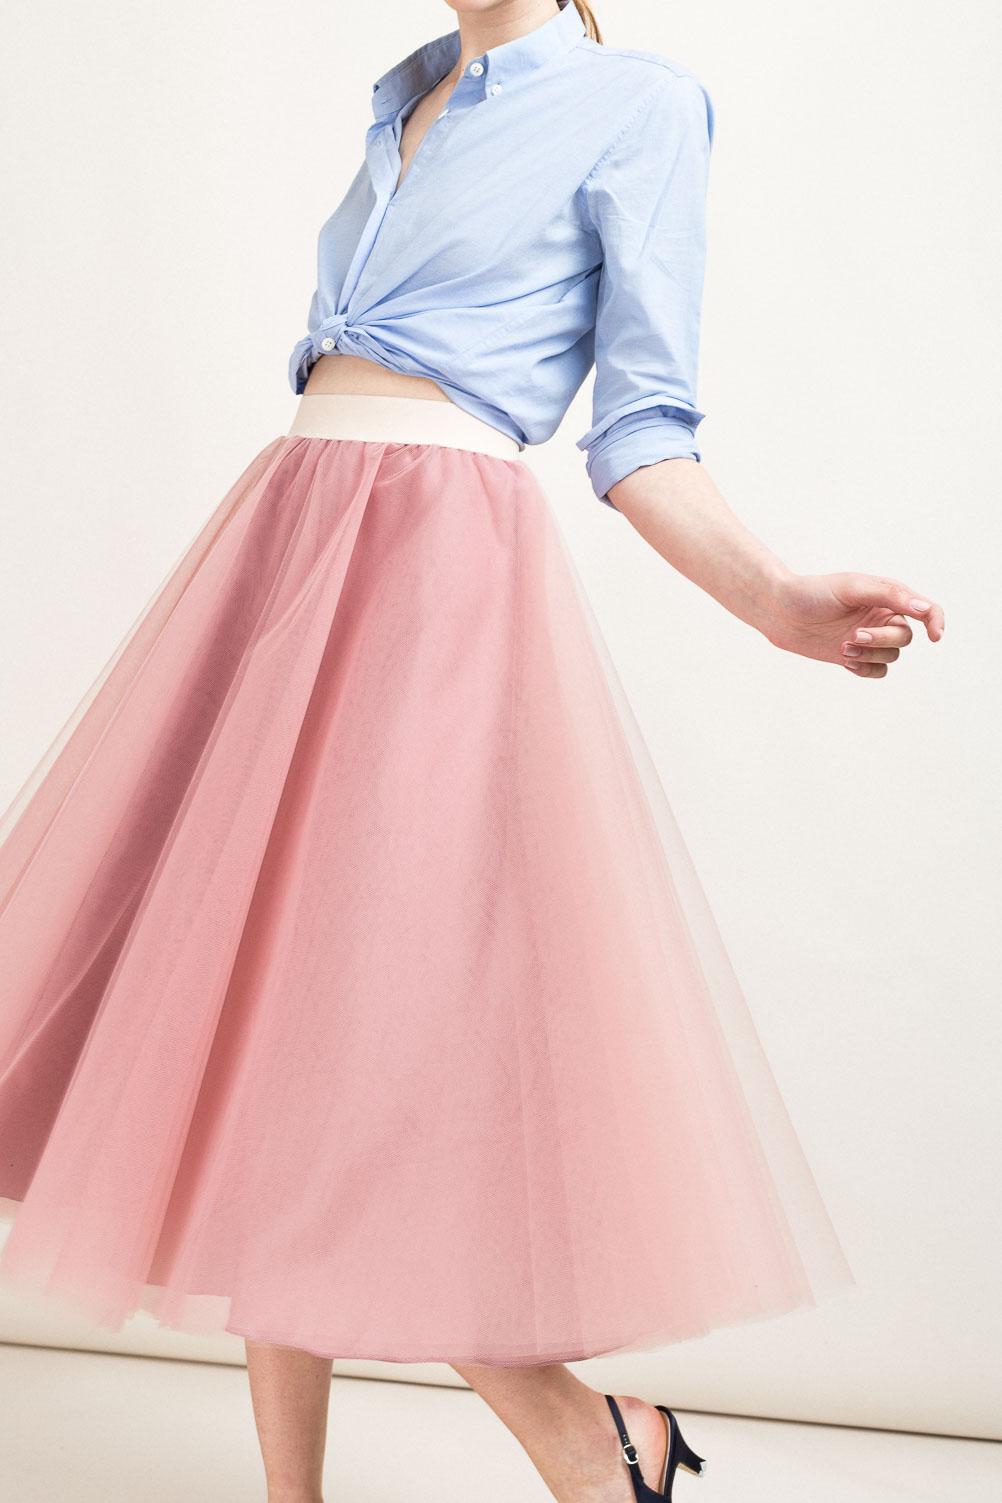 enorme sconto 040e5 455c4 MATTA E GOLDONI - Midi ballerina skirt in tulle - The Dressing Screen